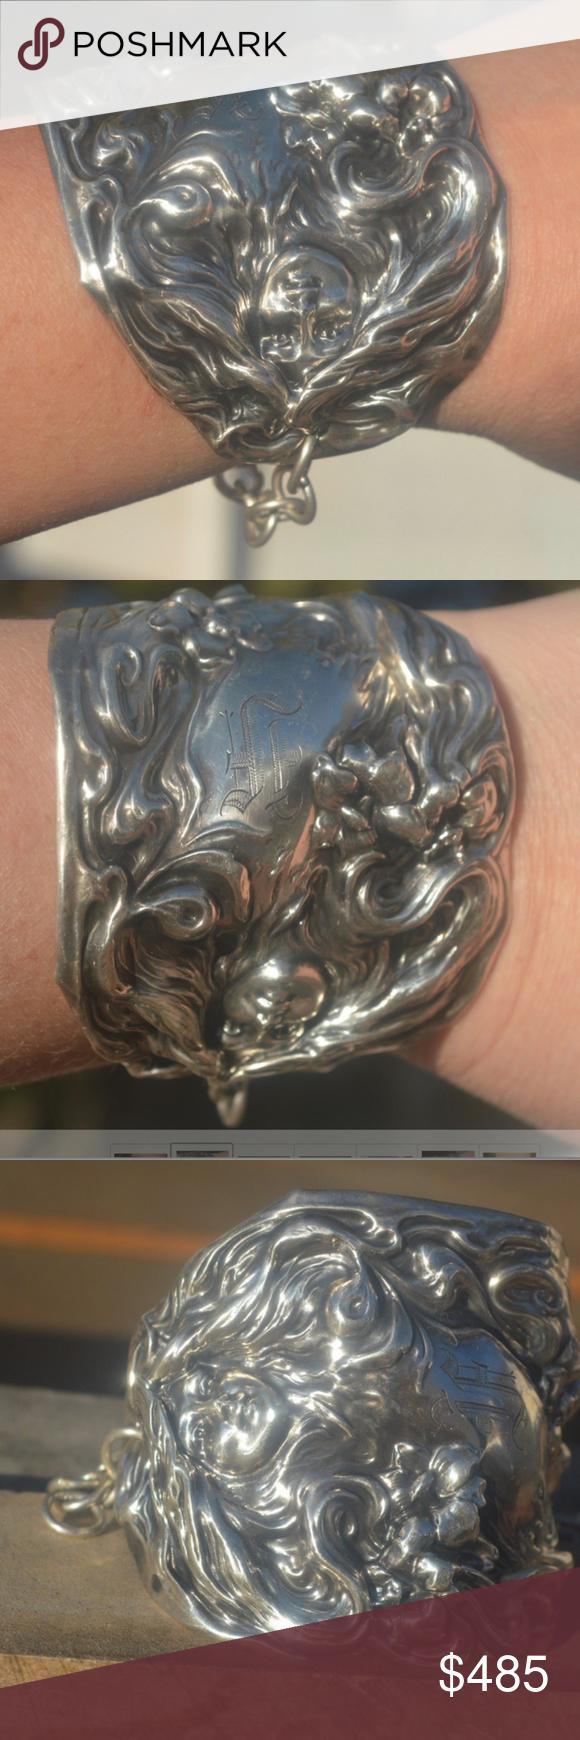 Art Nouveau Inspired California Poppy By Mason Larose: Art Nouveau Face Sterling Silver Cuff Bracelet 925 Thank